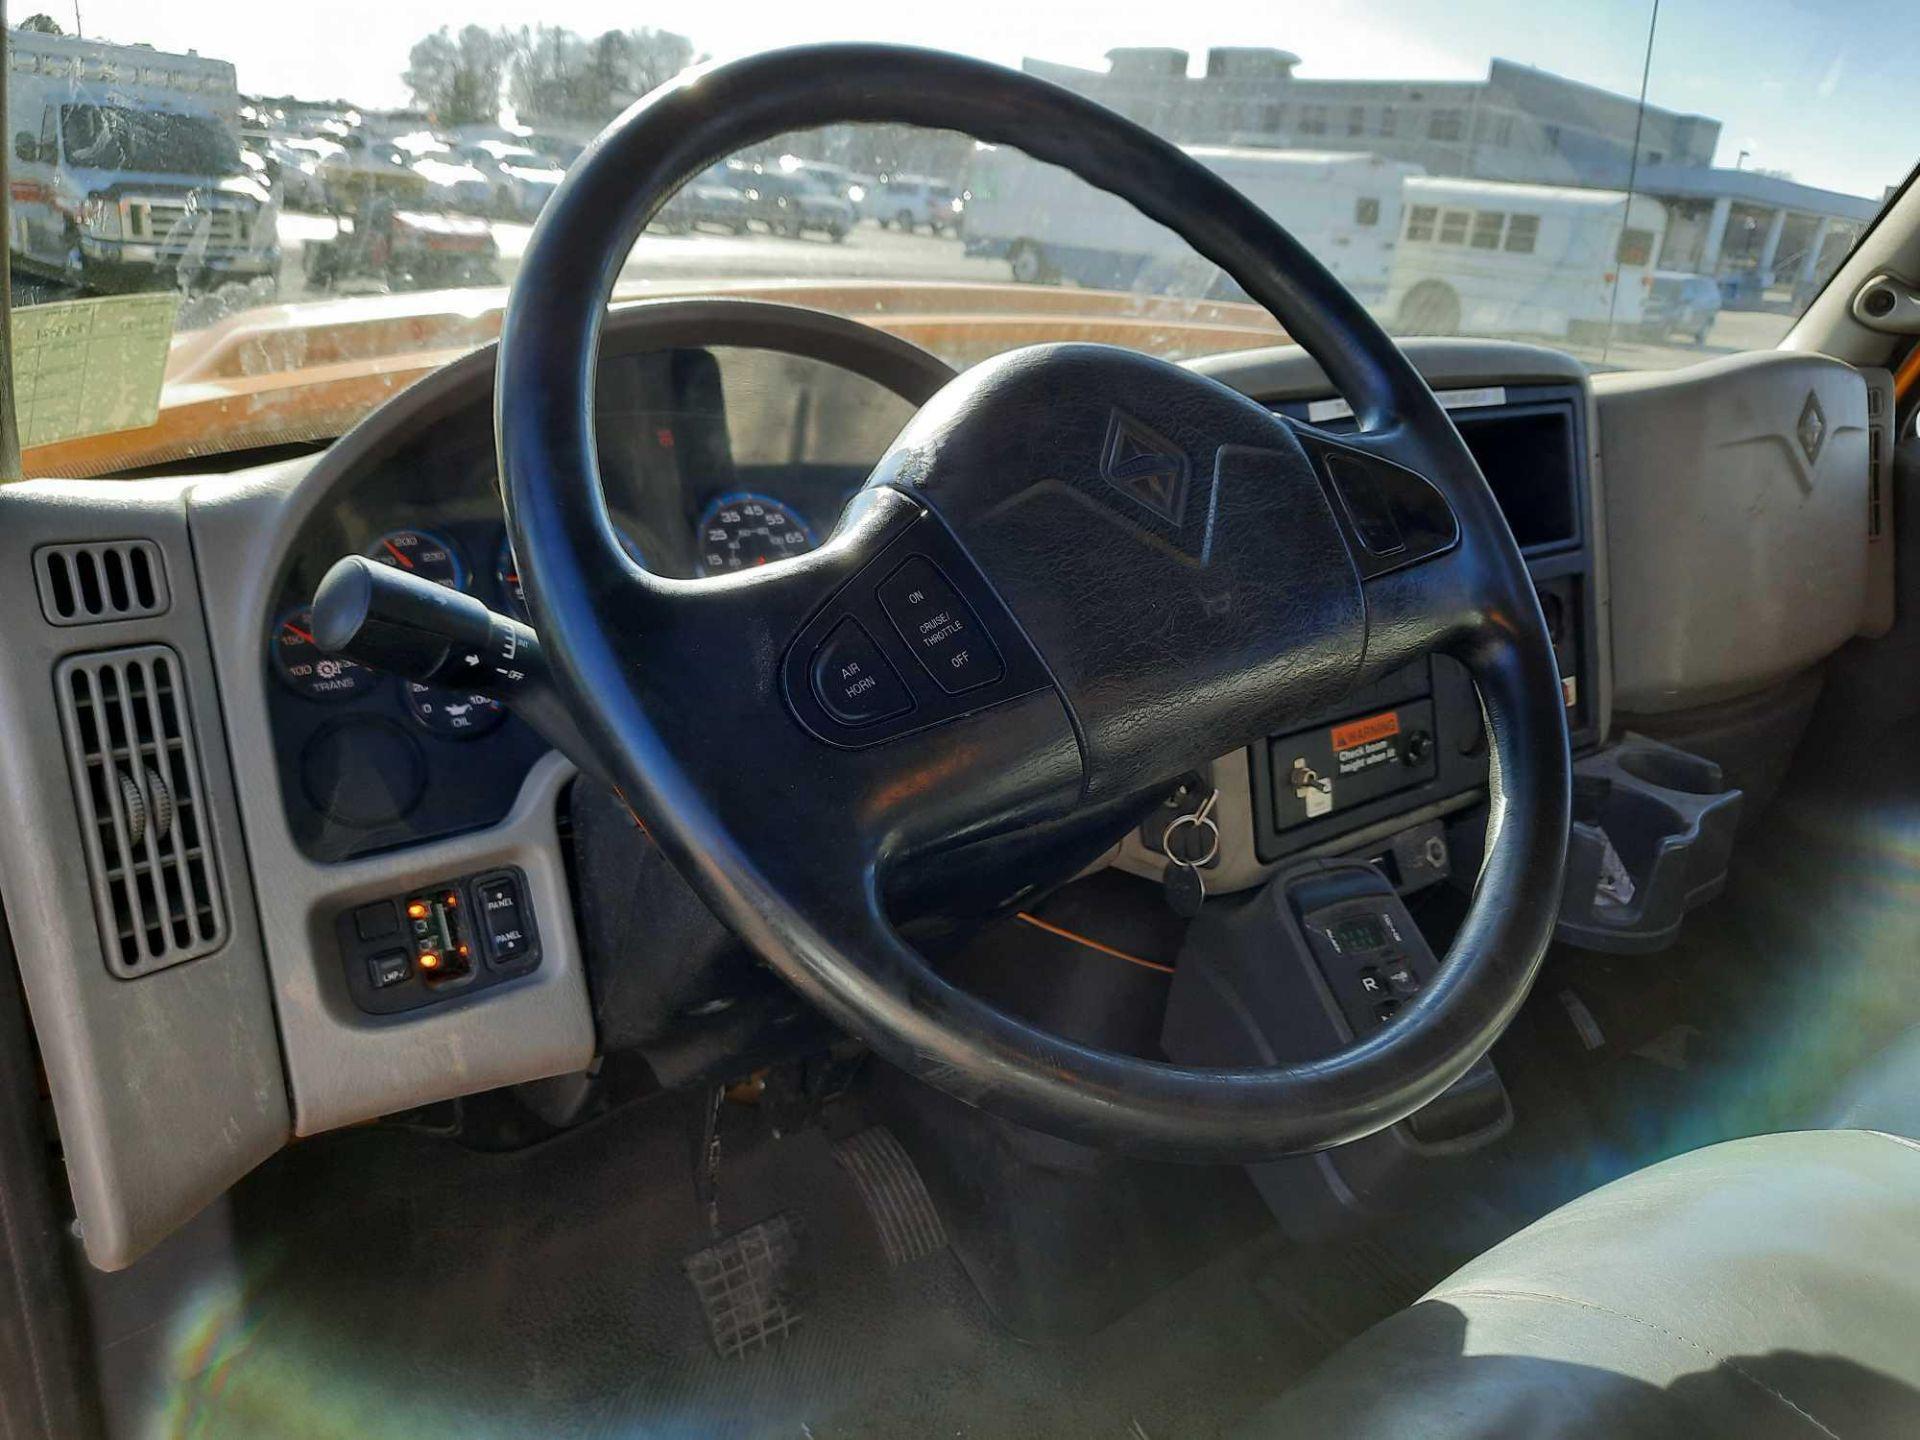 2010 INTERNATIONAL 7300S KNUCKLEBOOM TRUCK - Image 8 of 18